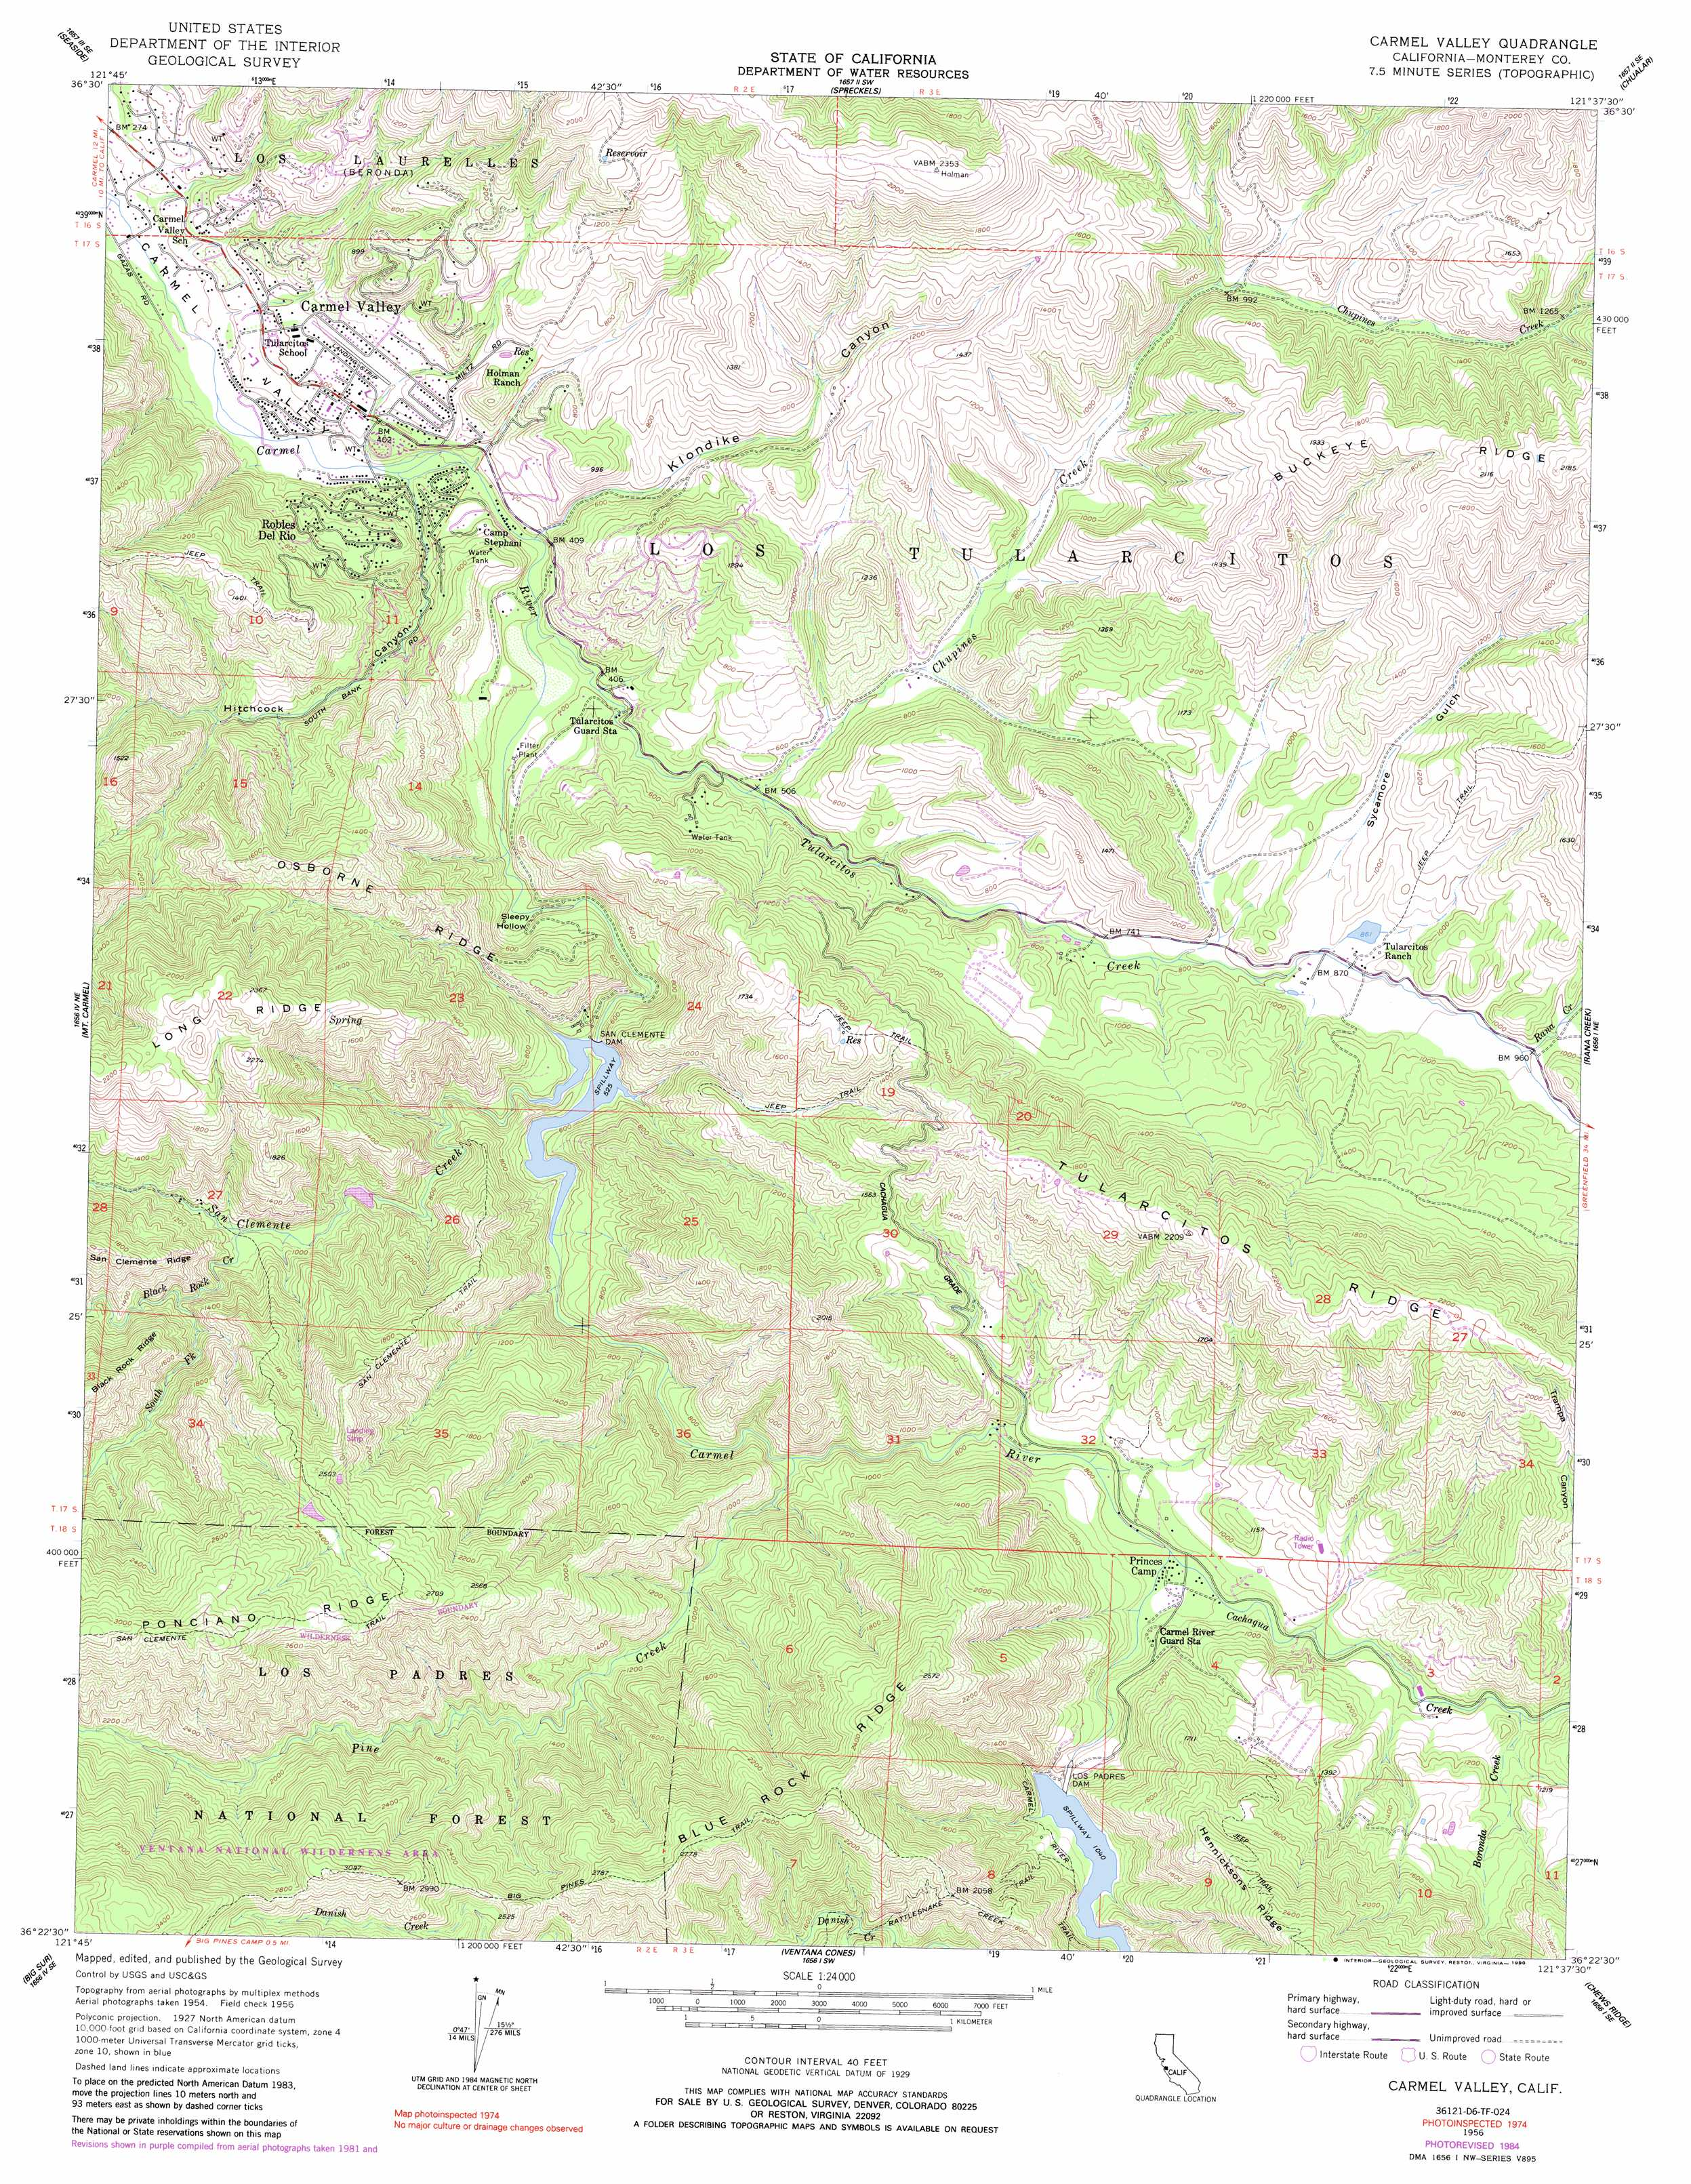 Carmel Valley topographic map CA USGS Topo Quad 36121d6